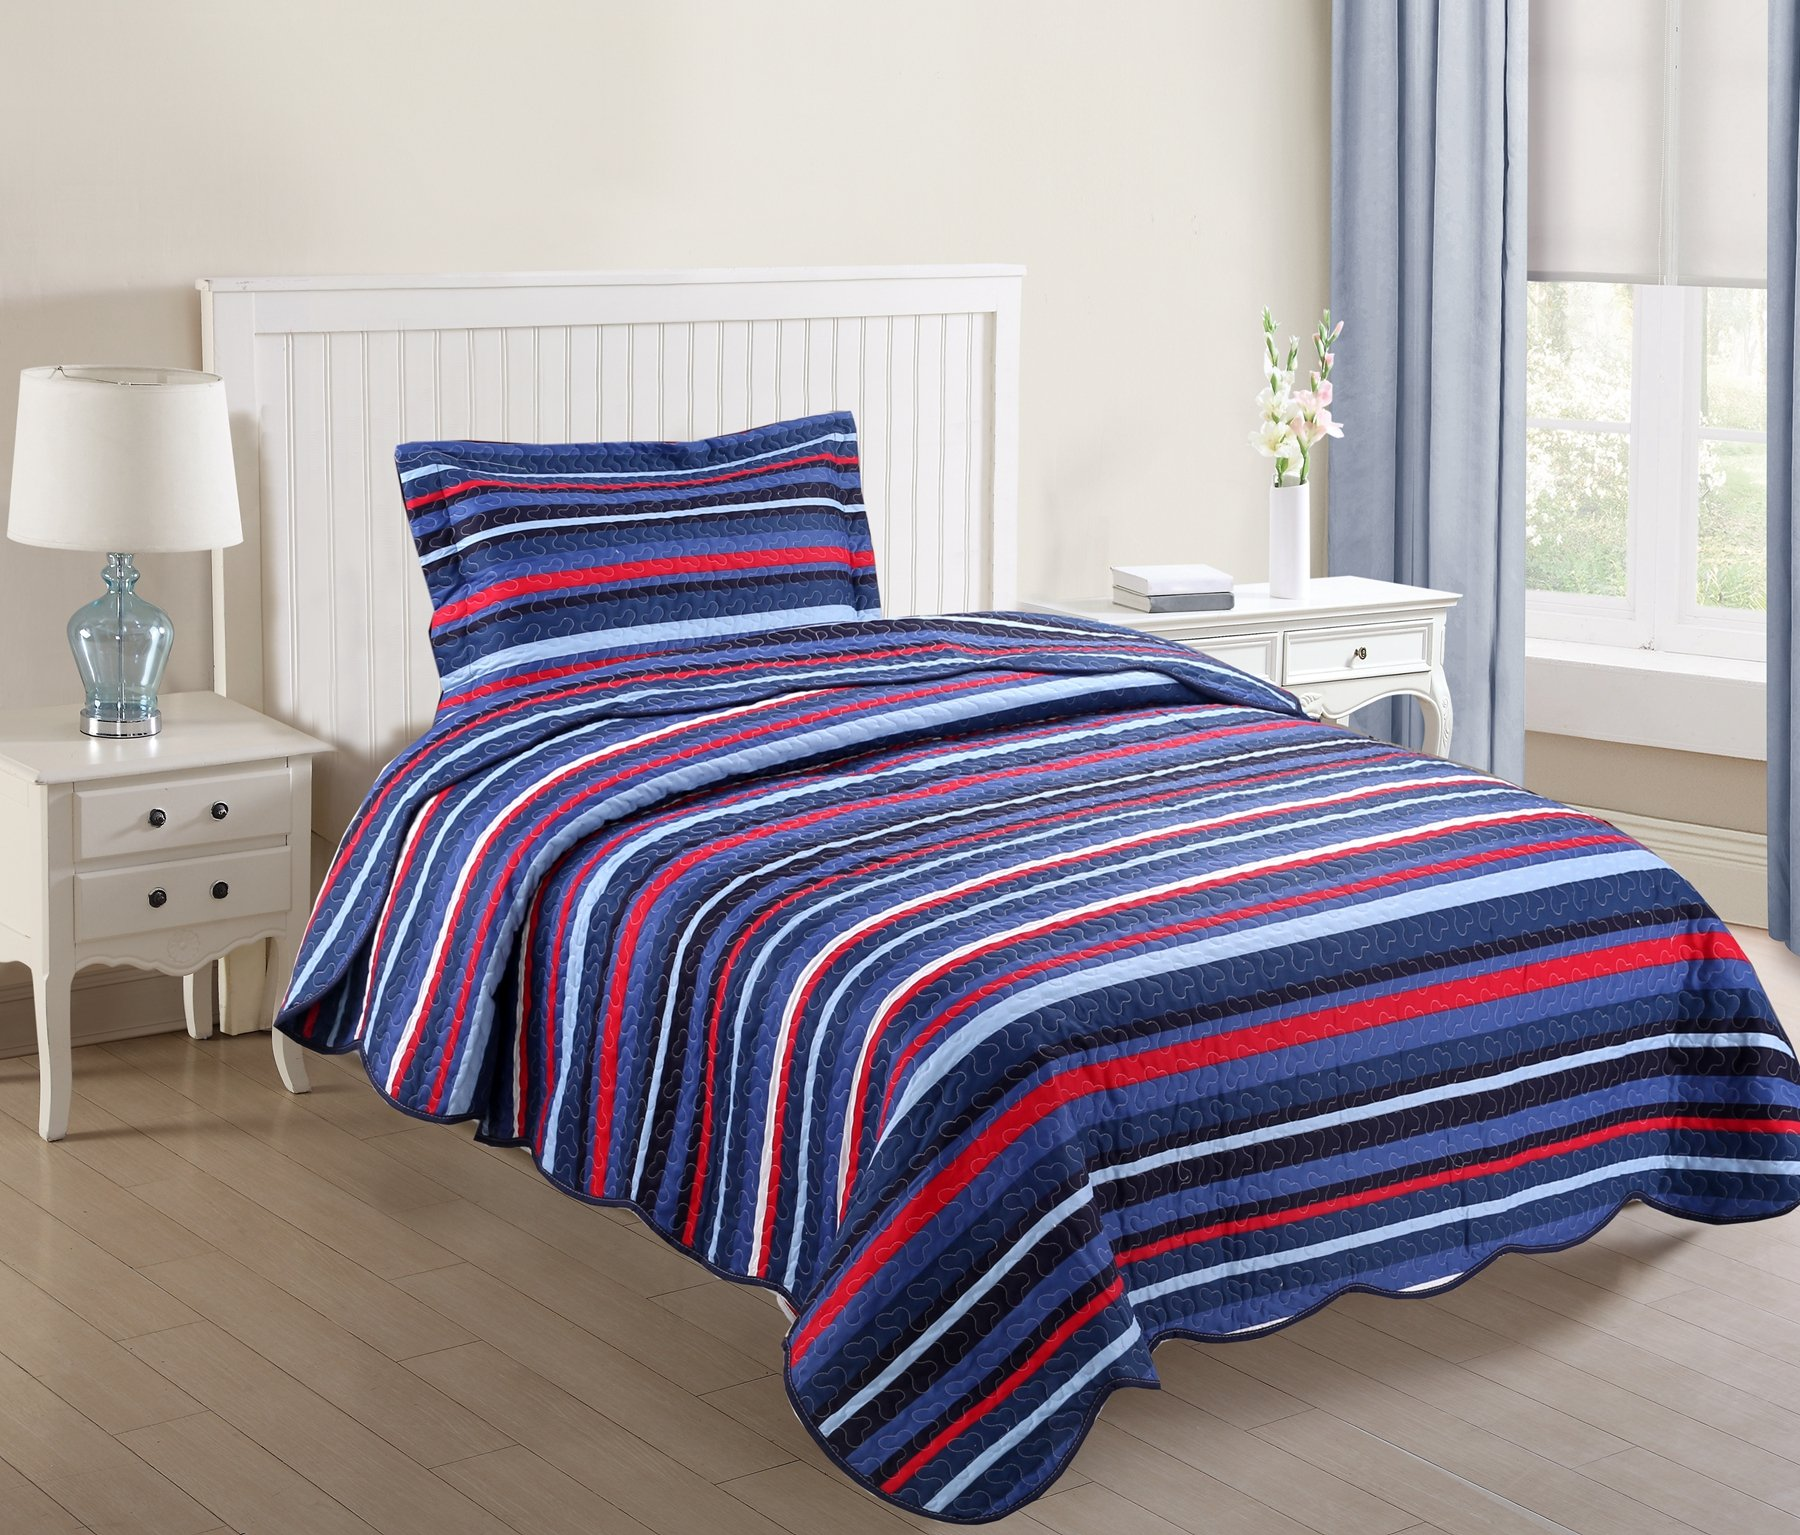 MarCielo 2 Piece Kids Bedspread Quilts Set Throw Blanket for Teens Boys Girls Bed Printed Bedding Coverlet, Twin Size (Navy Blue Ocean Breeze)